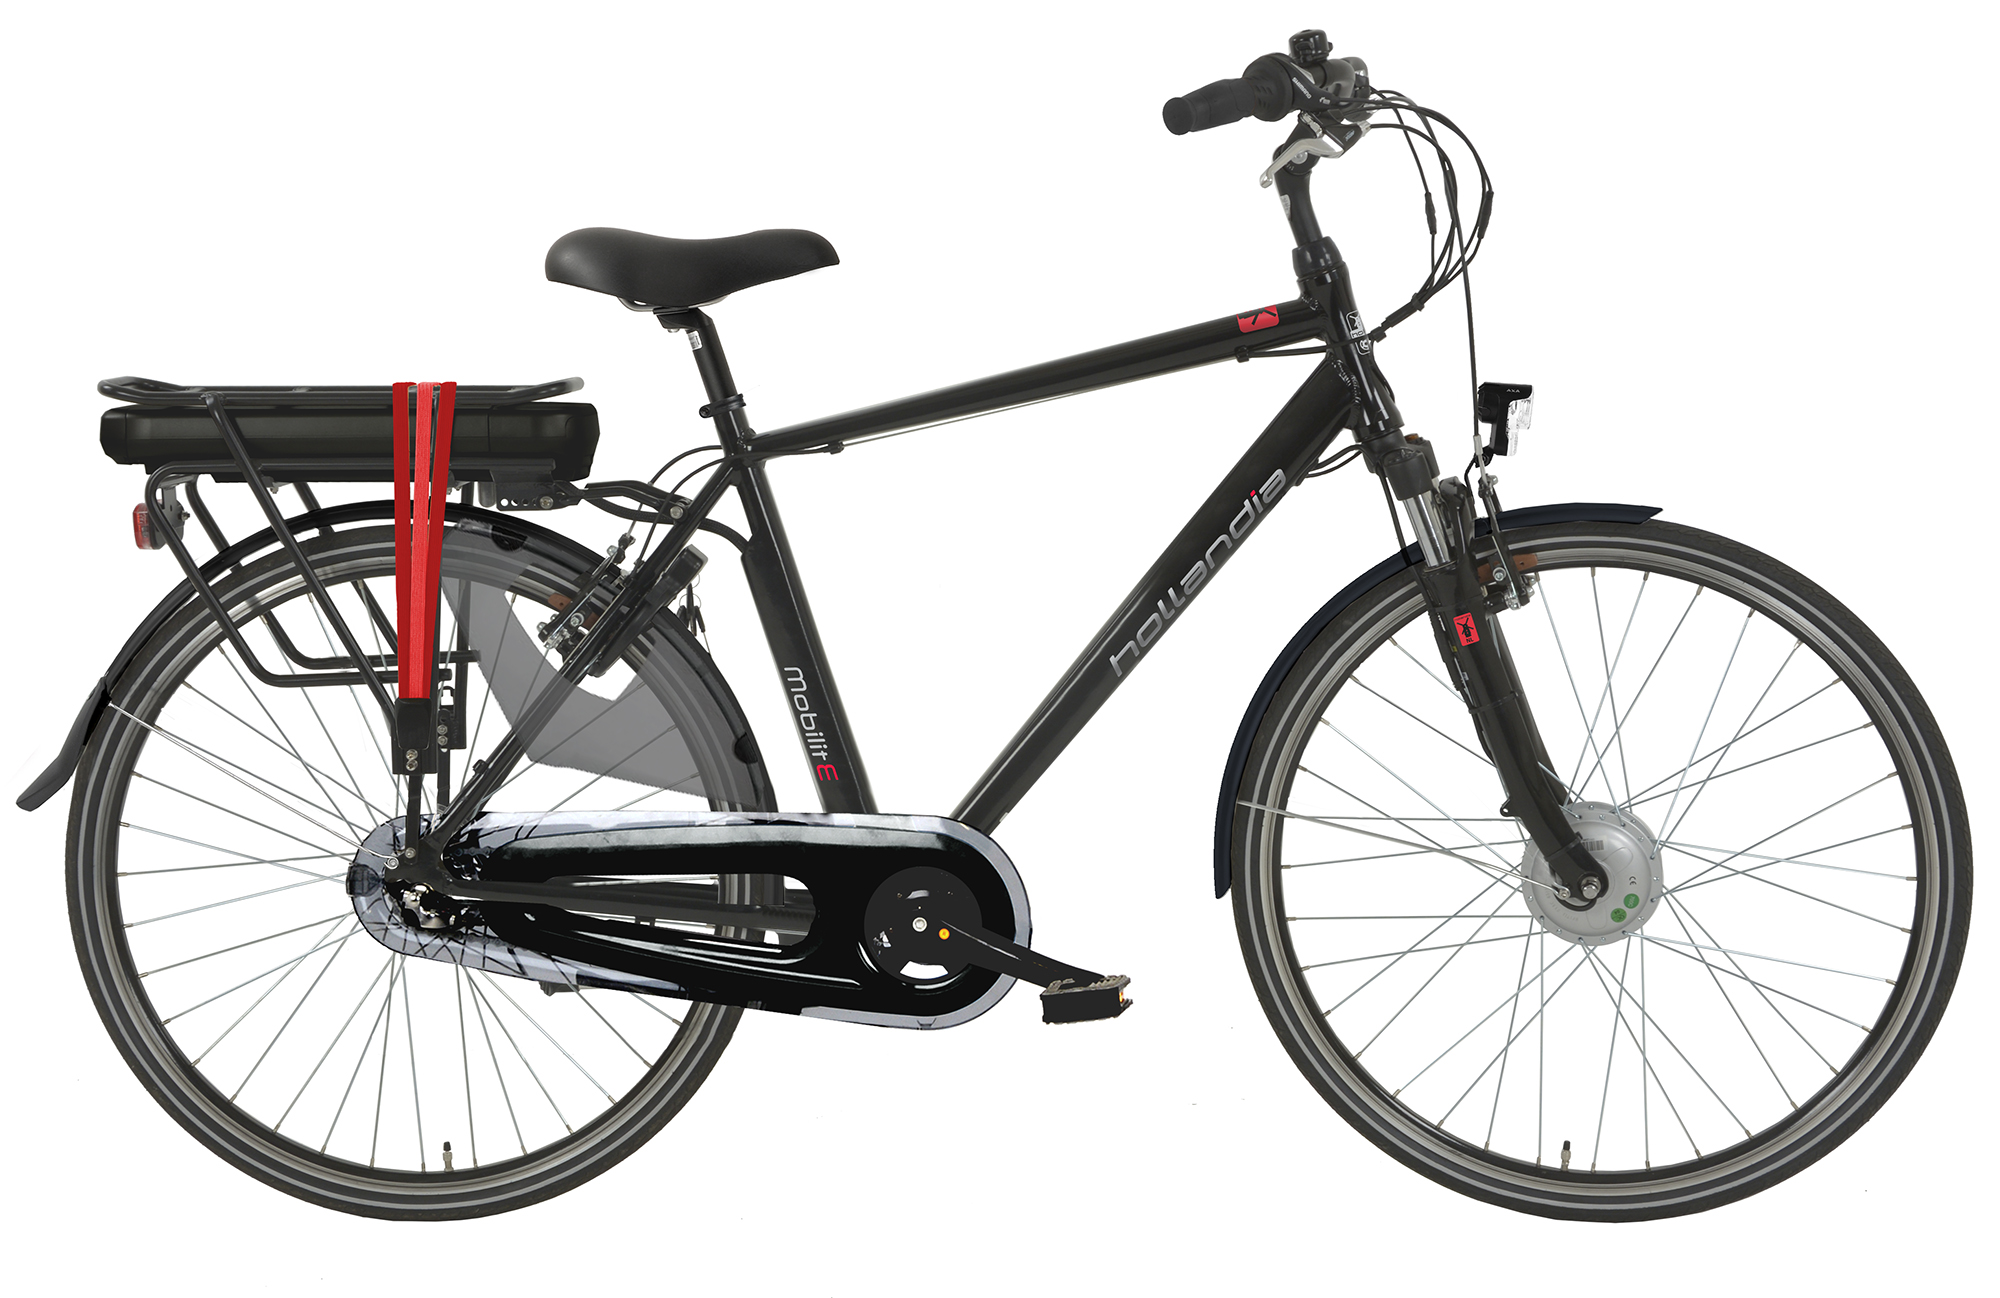 Hollandia Mobilit E Aluminum Large Xl 22 Inch Shimano